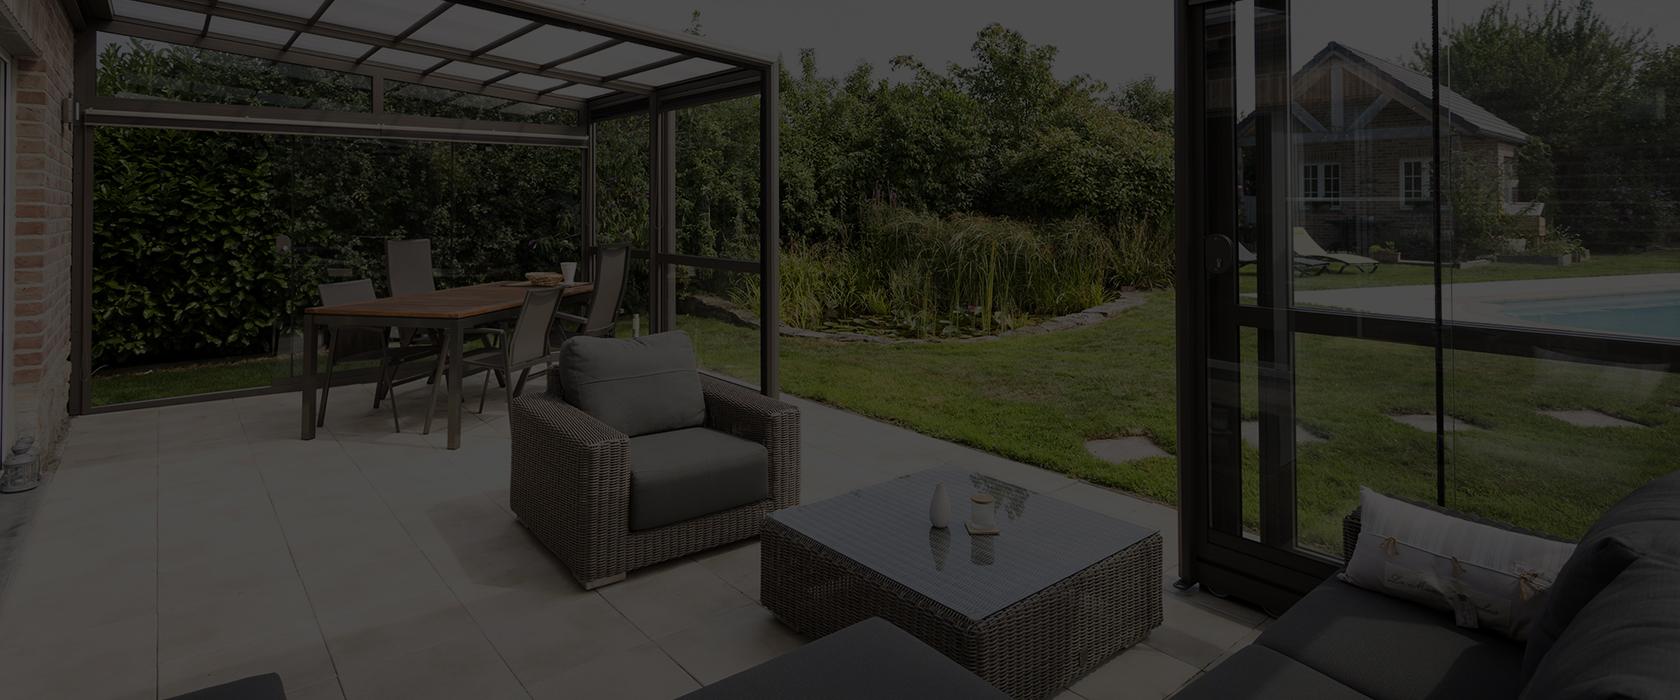 Patioscipic-Residential-Patio-Cover-1